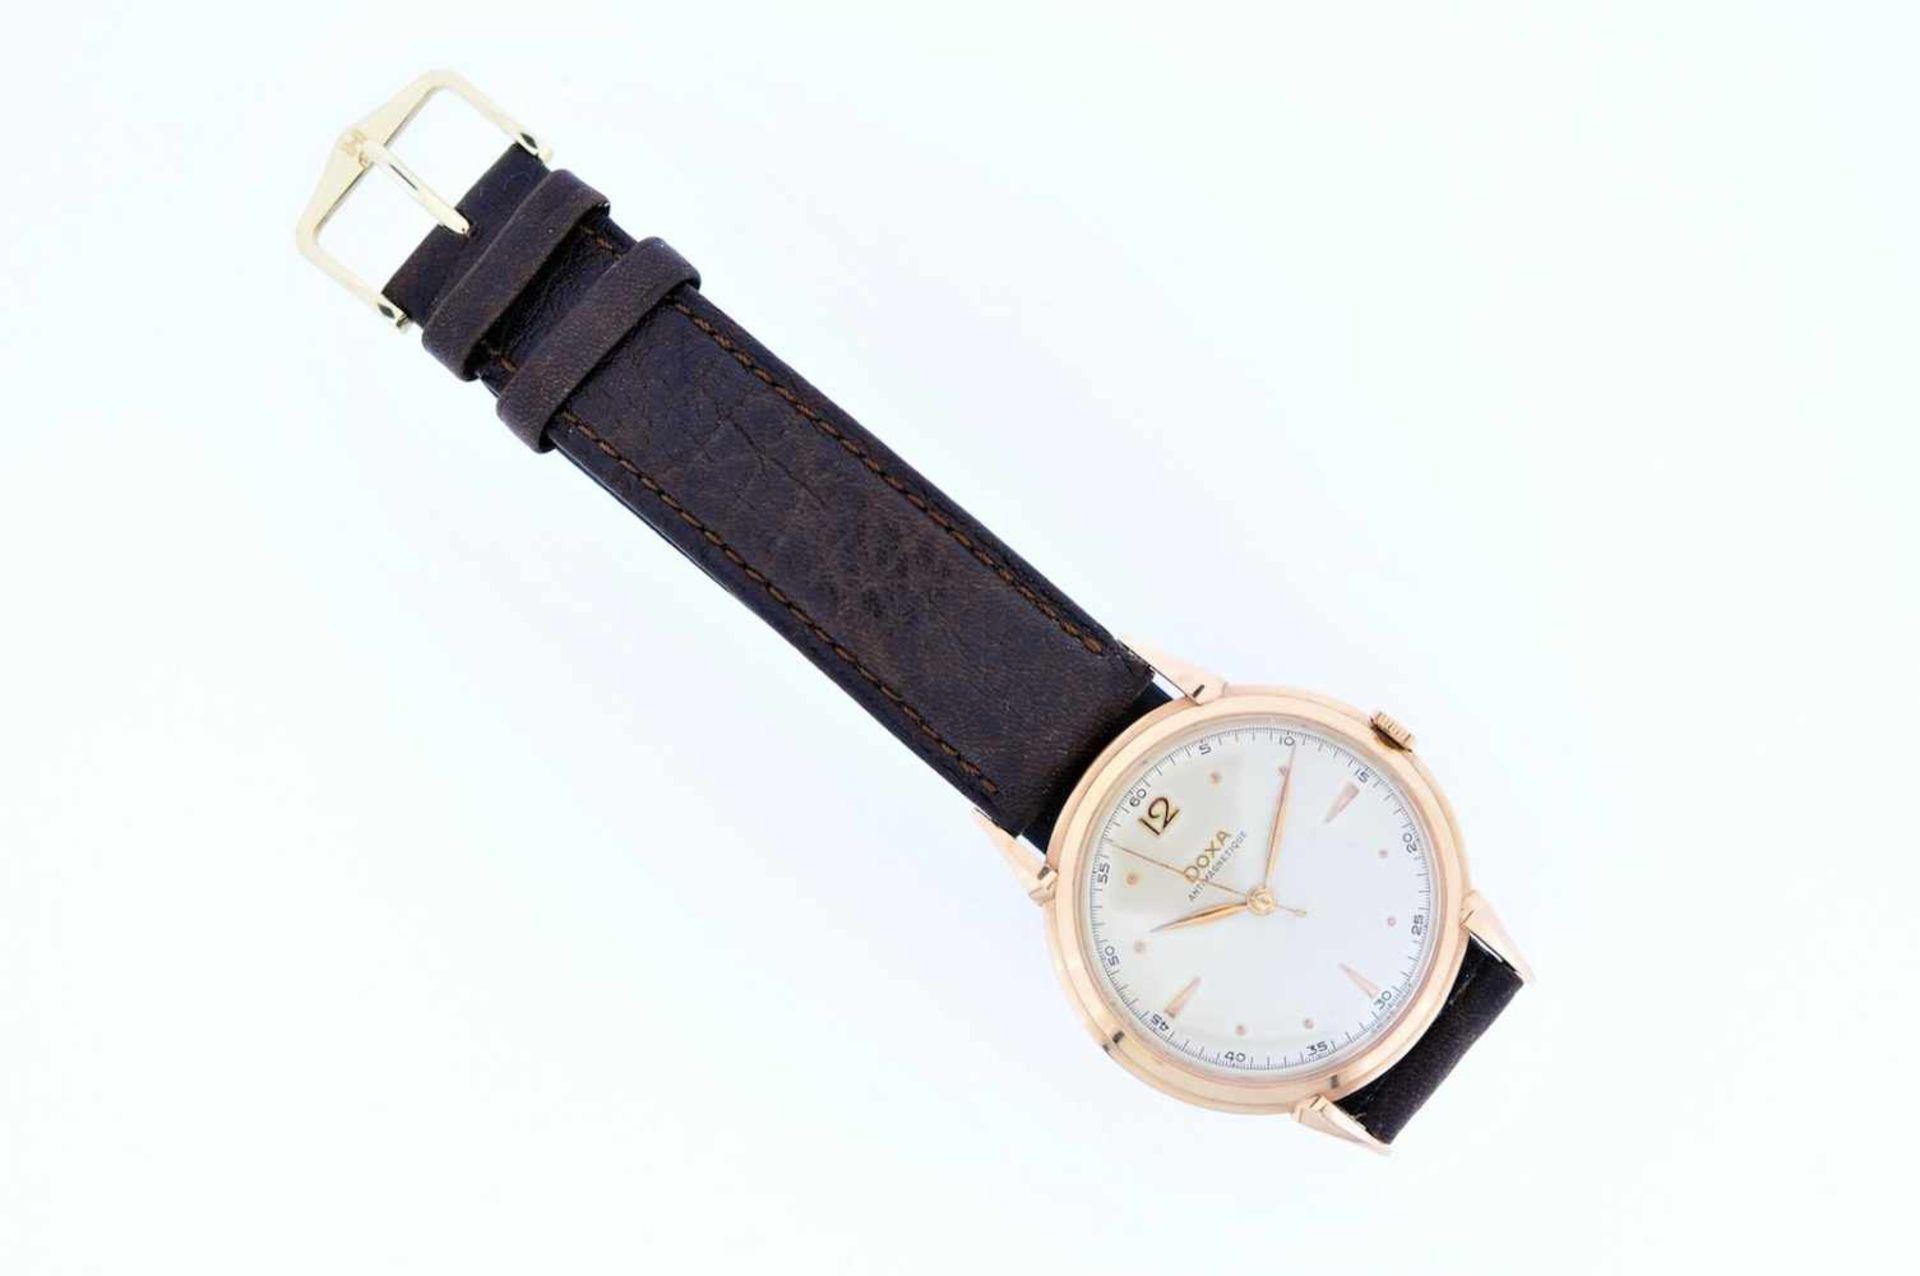 Los 24 - Doxa Roségoldene Armbanduhr an Lederband, Doxa Antimagnetique, Handaufzug, Ankerwerk,